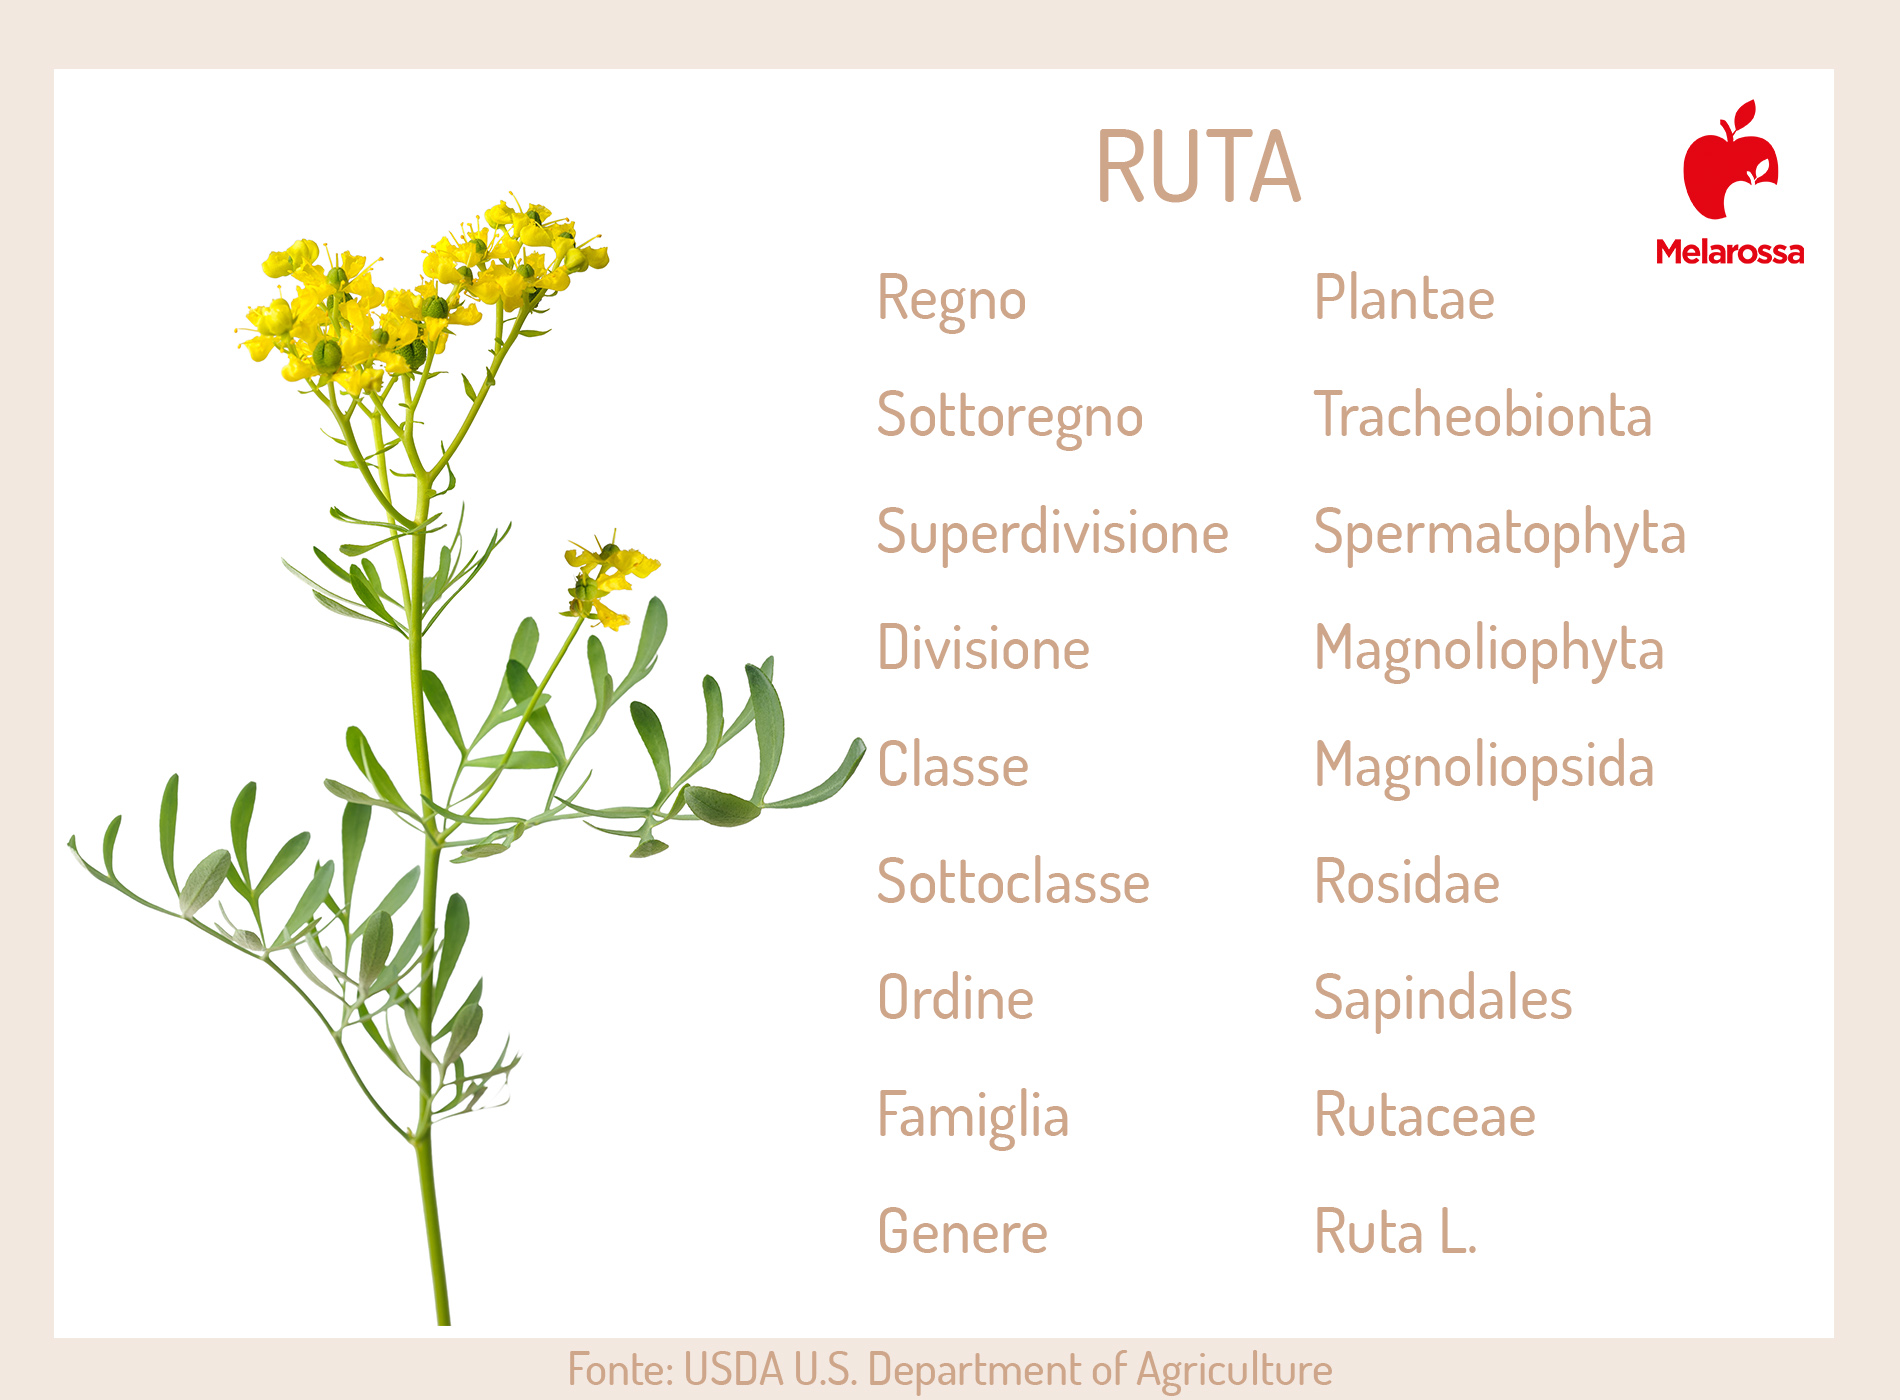 Ruta: botanica